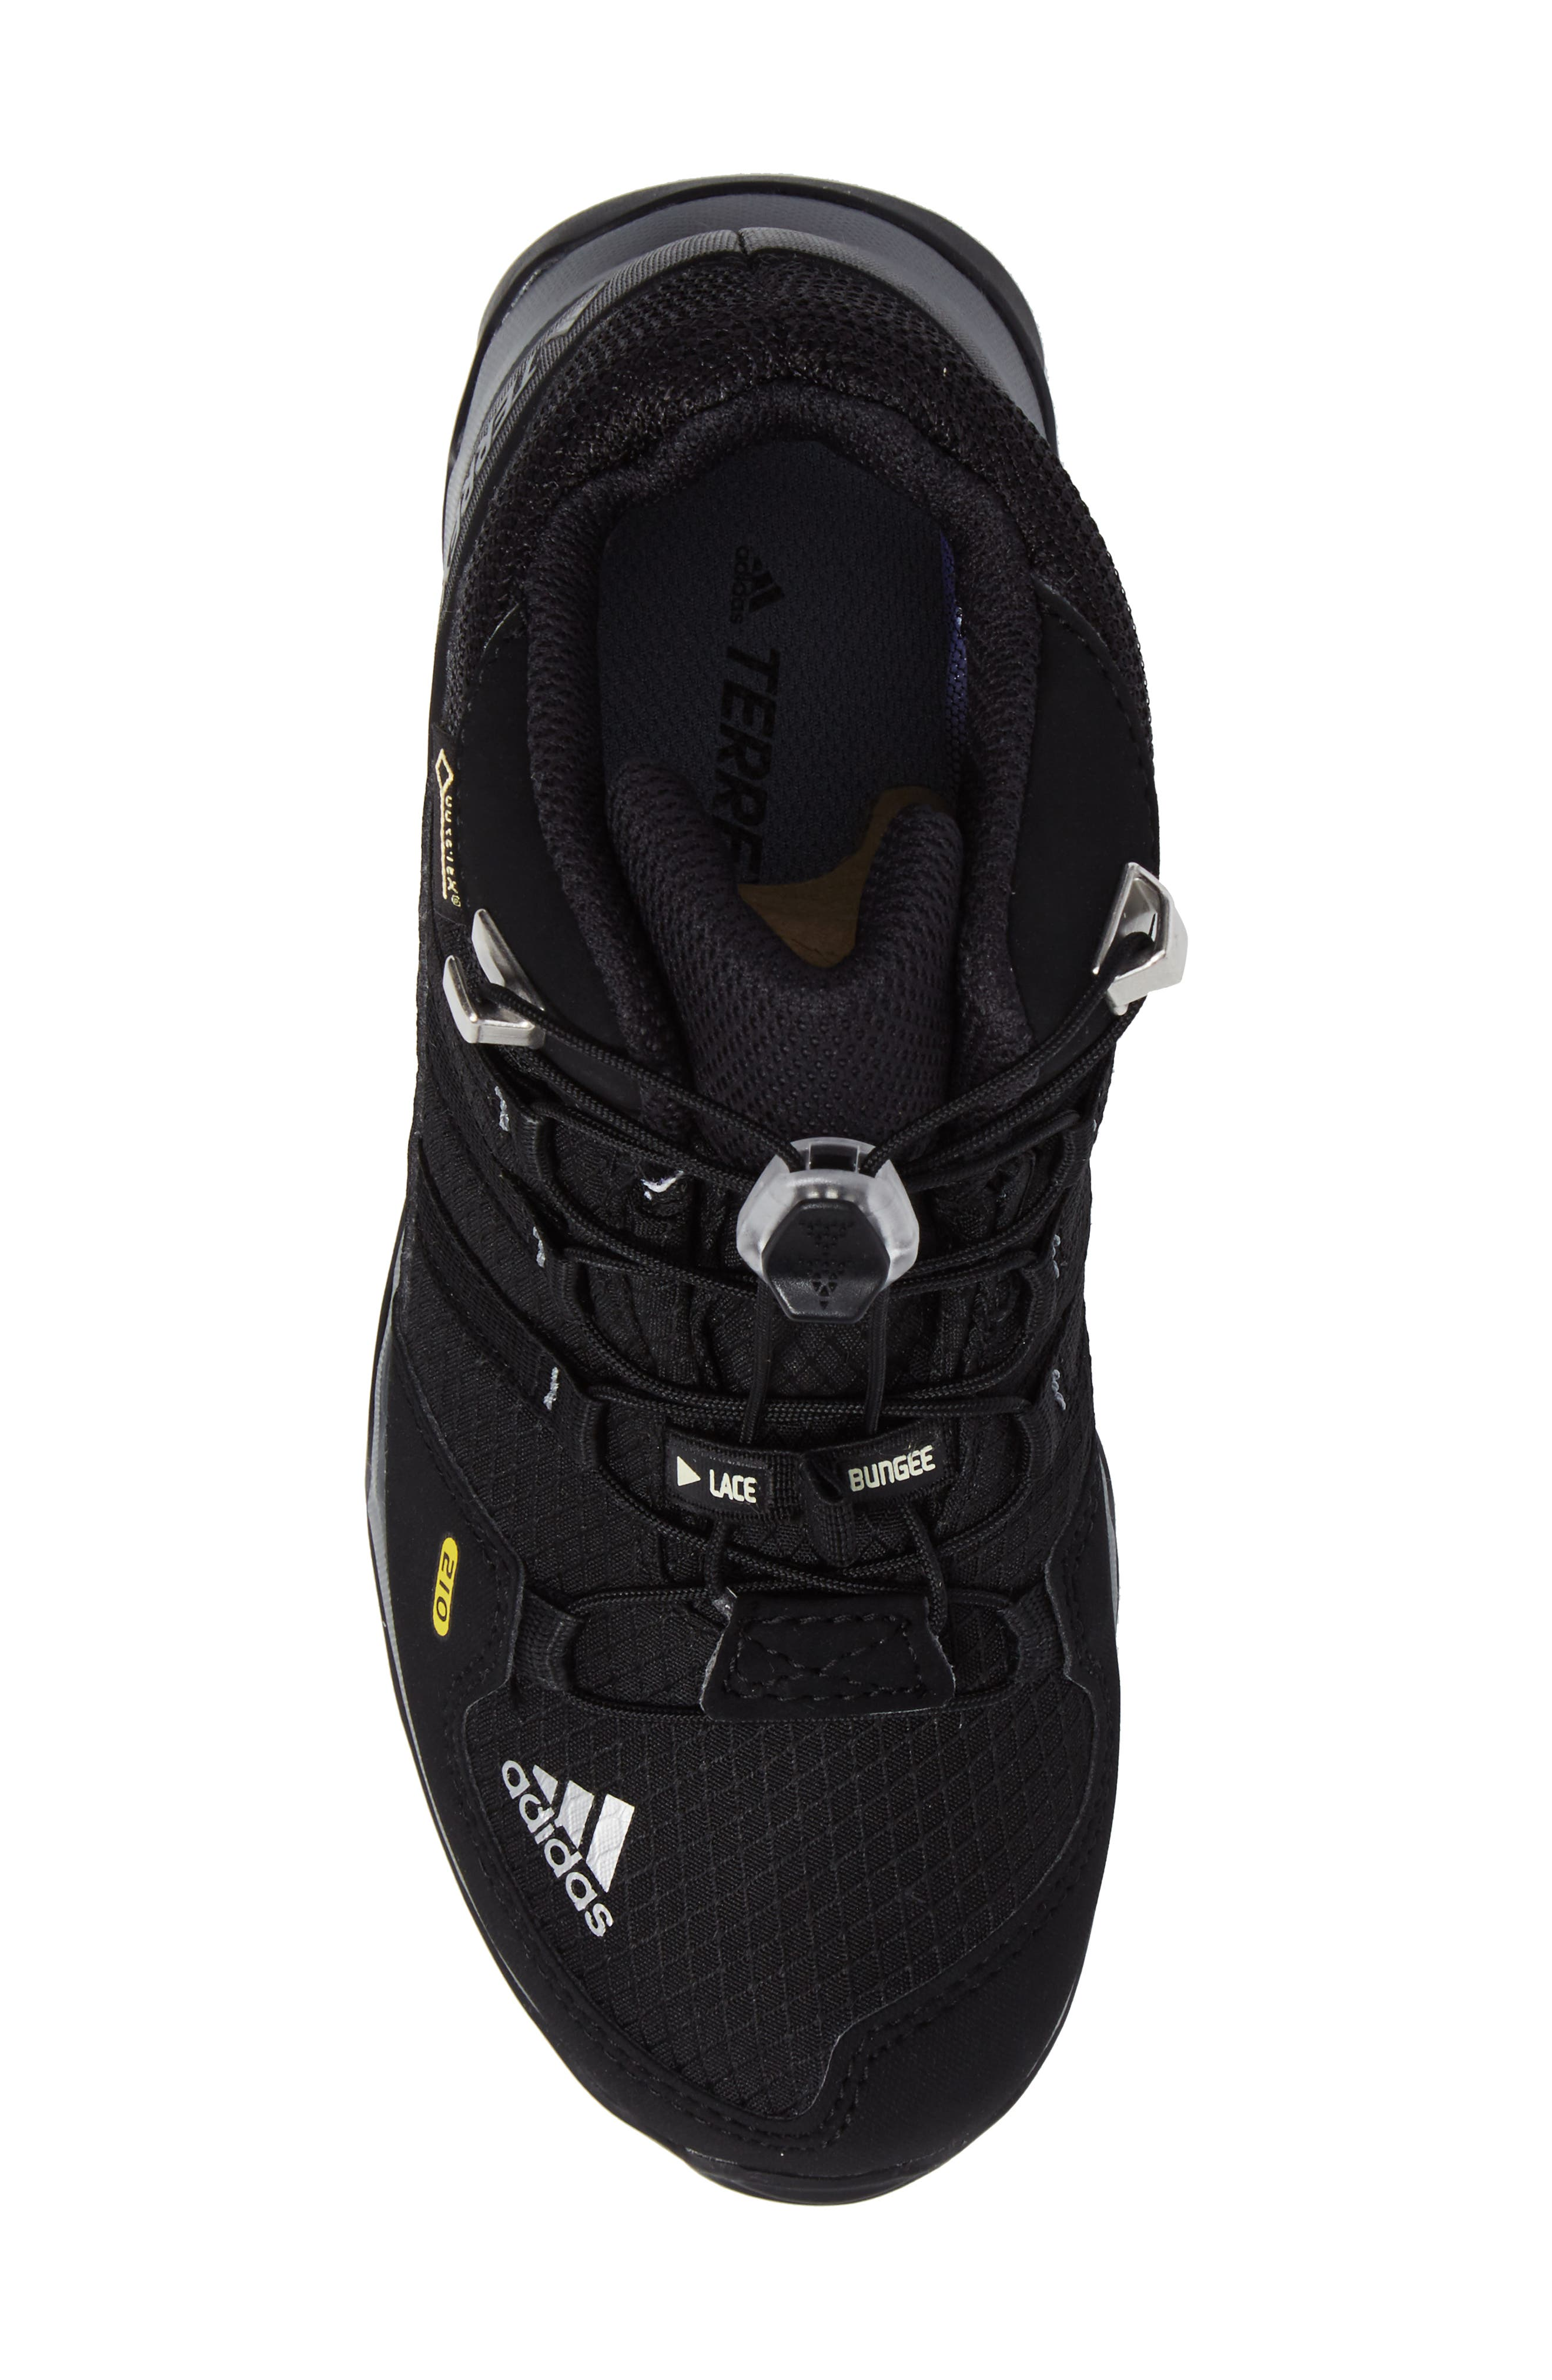 Terrex Mid Gore-Tex<sup>®</sup> Insulated Waterproof Sneaker Boot,                             Alternate thumbnail 5, color,                             Black/ Black/ Vista Grey